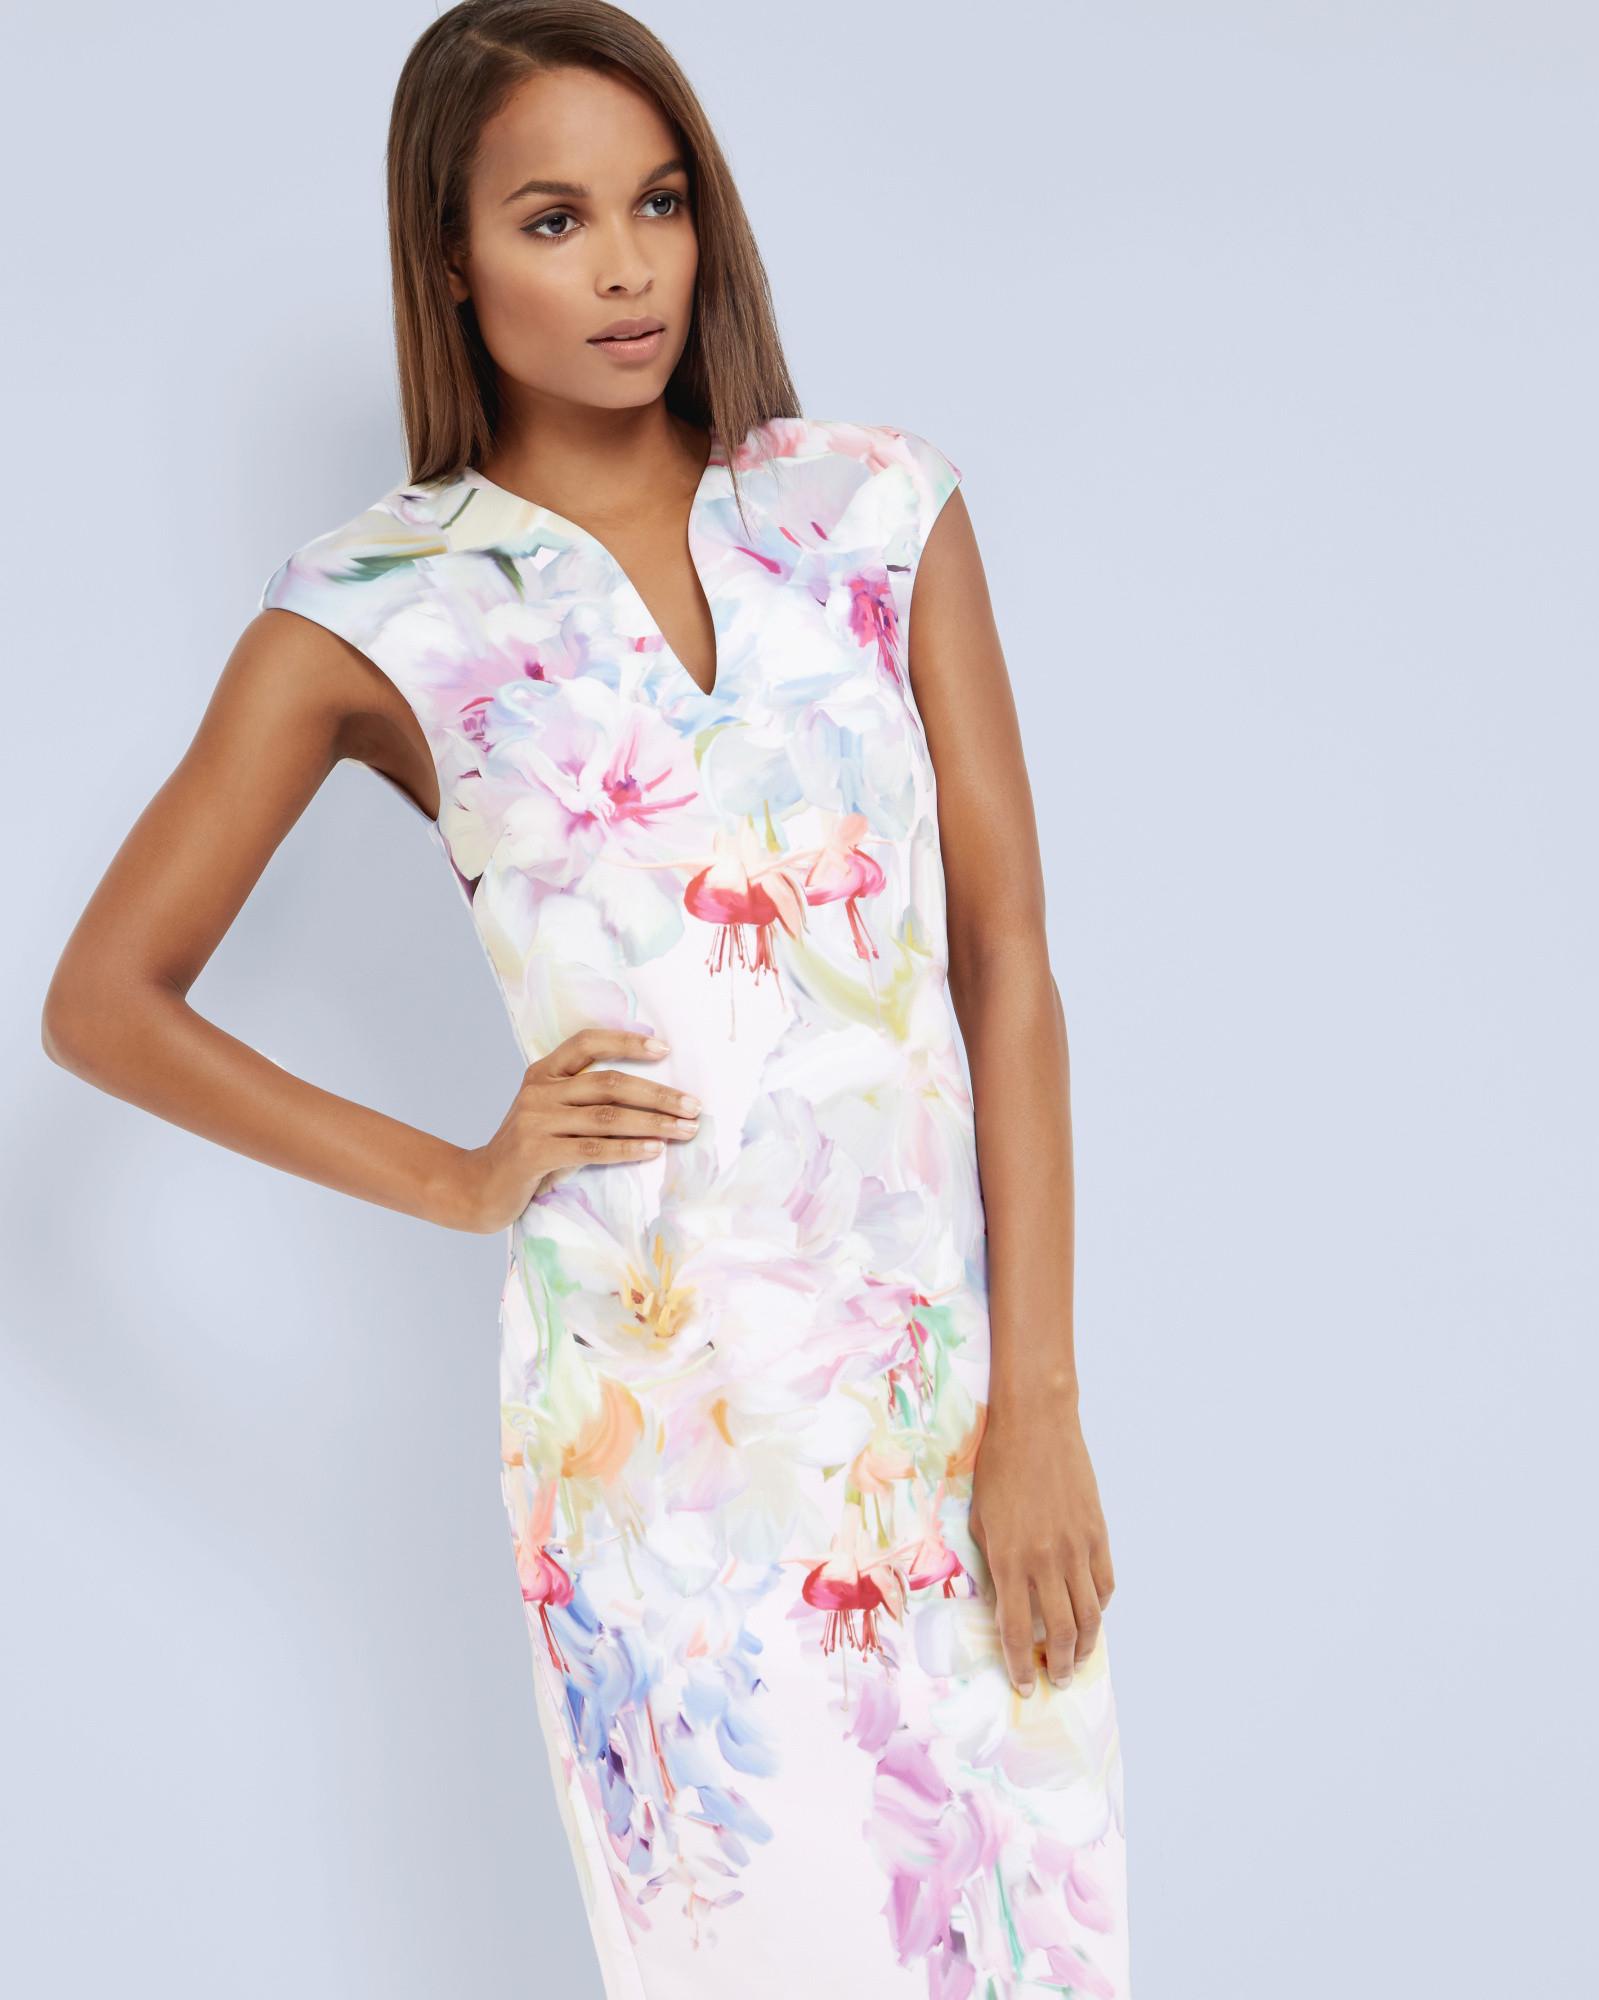 cf03c6877870b Lyst - Ted Baker Hanging Gardens Bodycon Dress